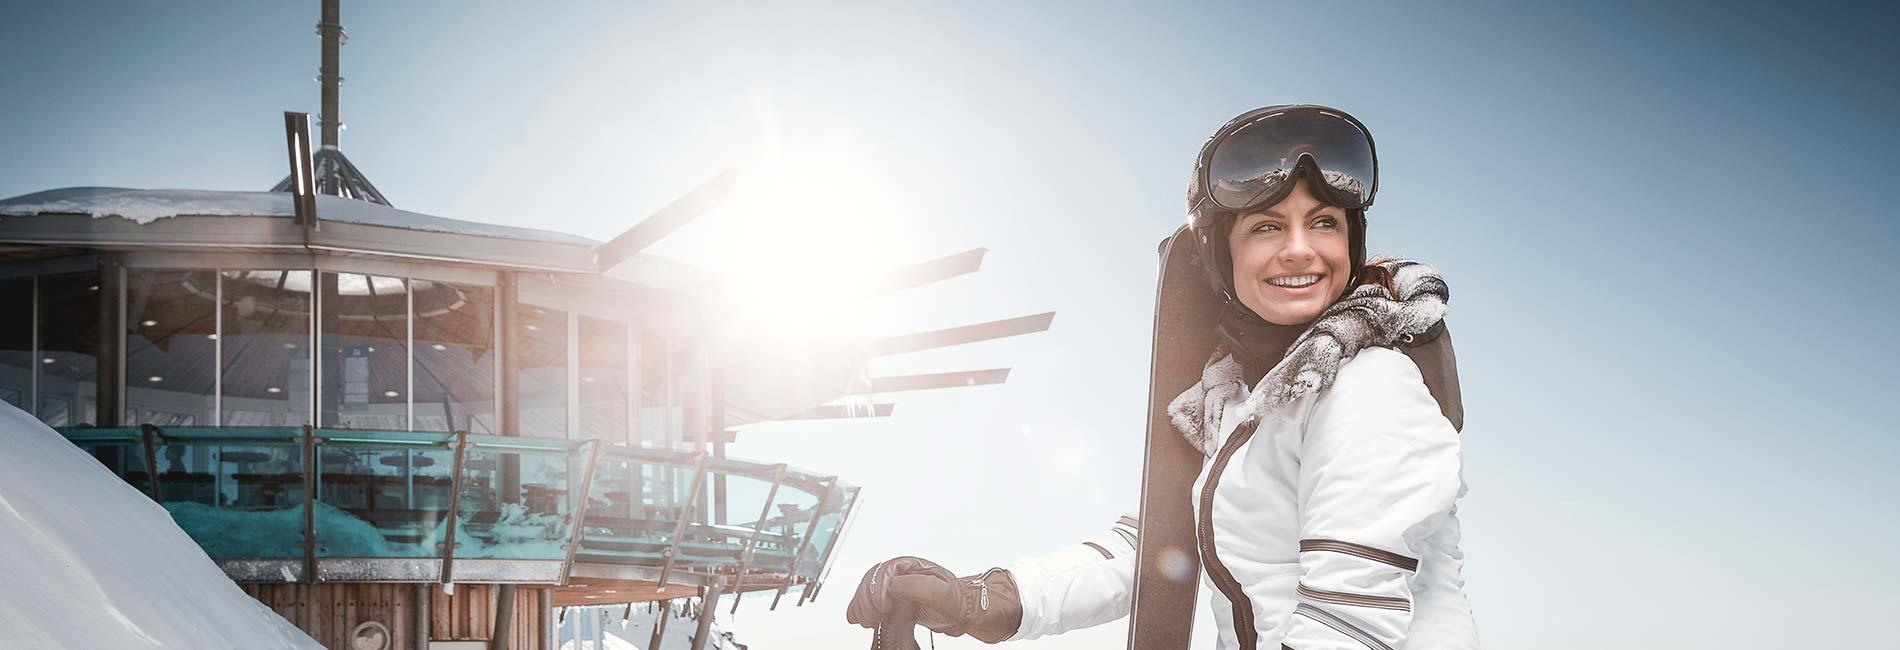 TOP Mountain Star im Skigebiet Obergurgl Hochgurgl Ötztal Tirol Austria